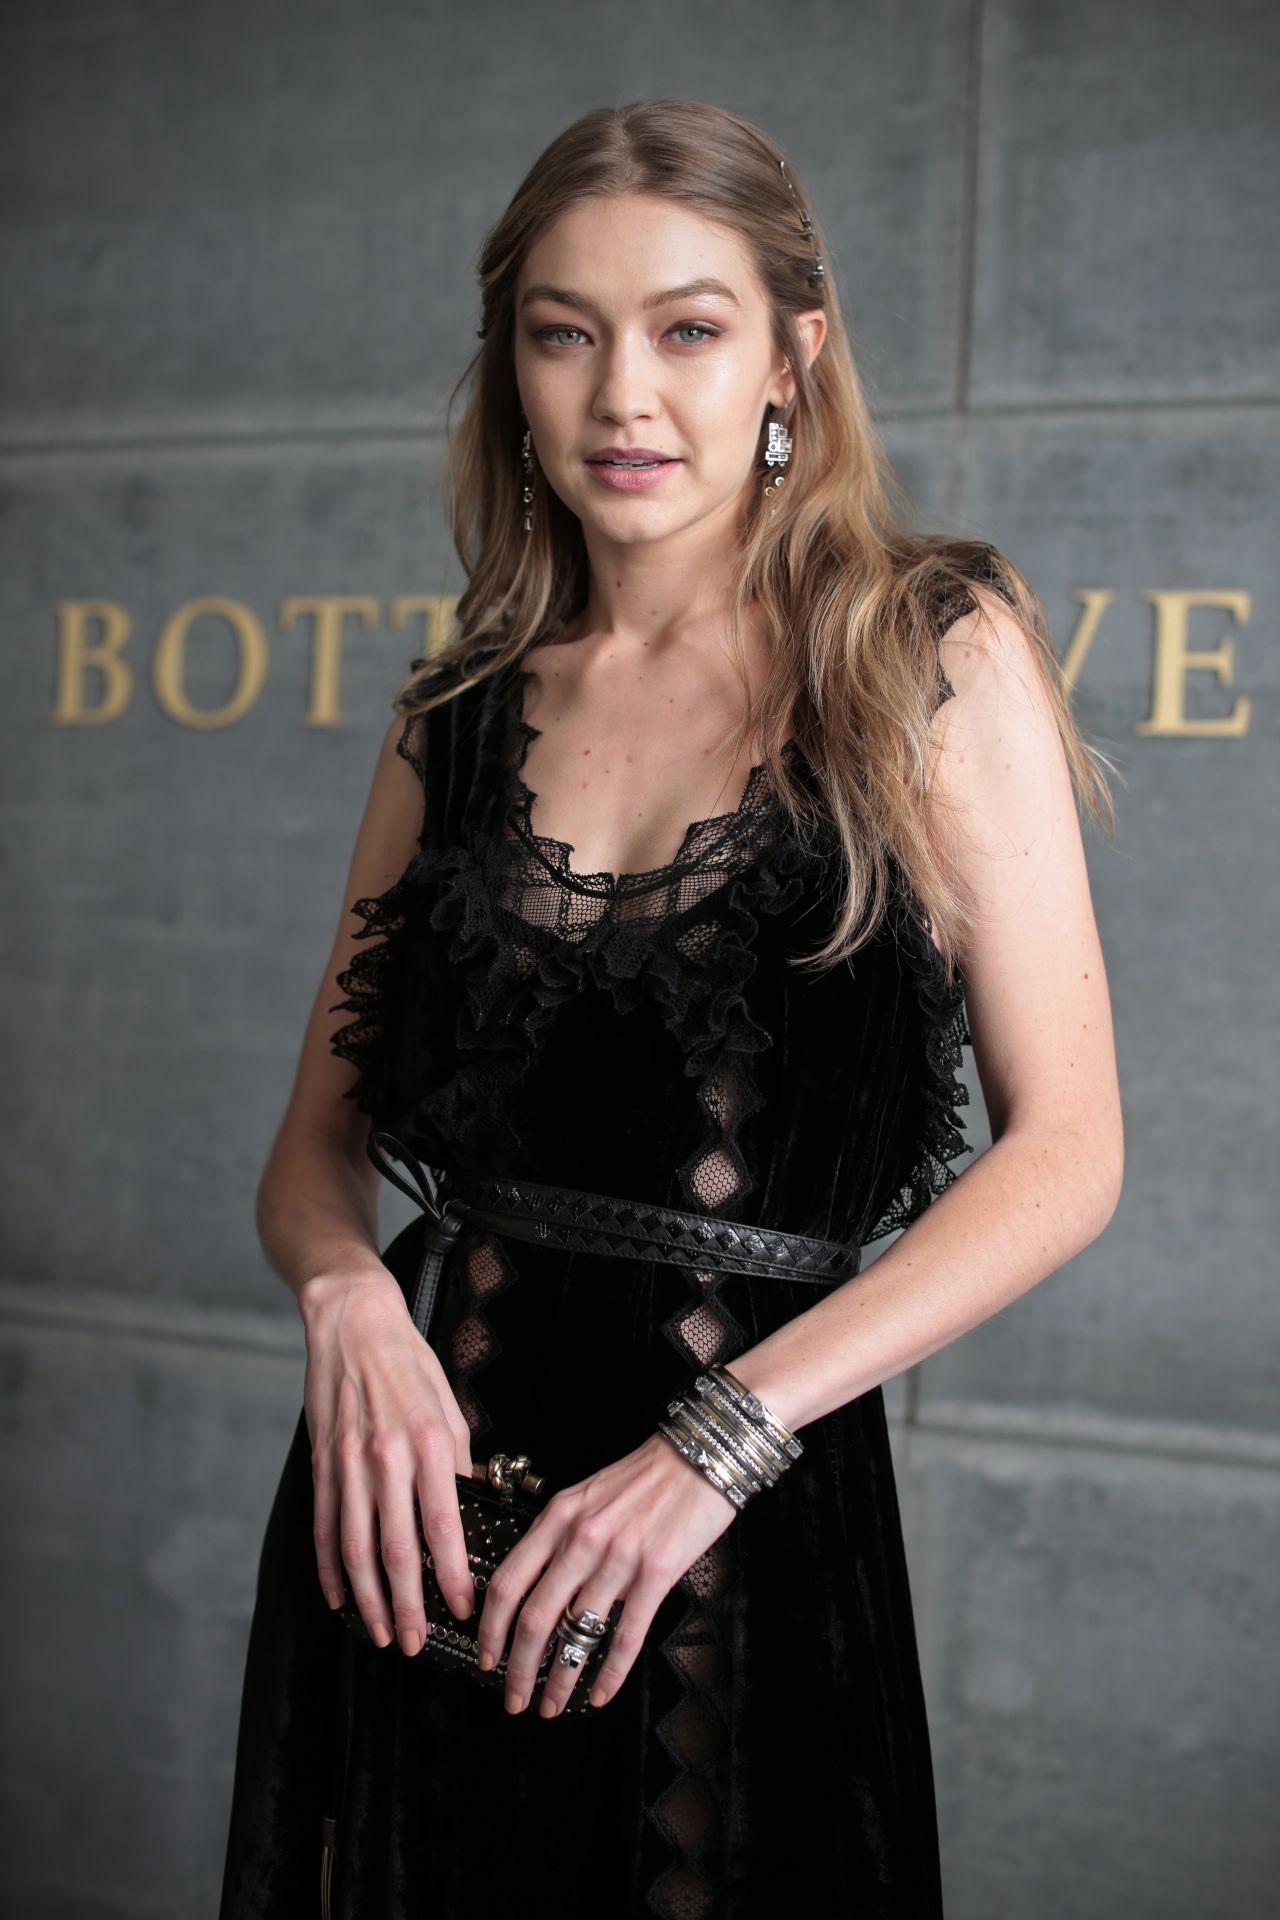 Gigi Hadid Bottega Veneta Show At Nyfw 02 09 2018